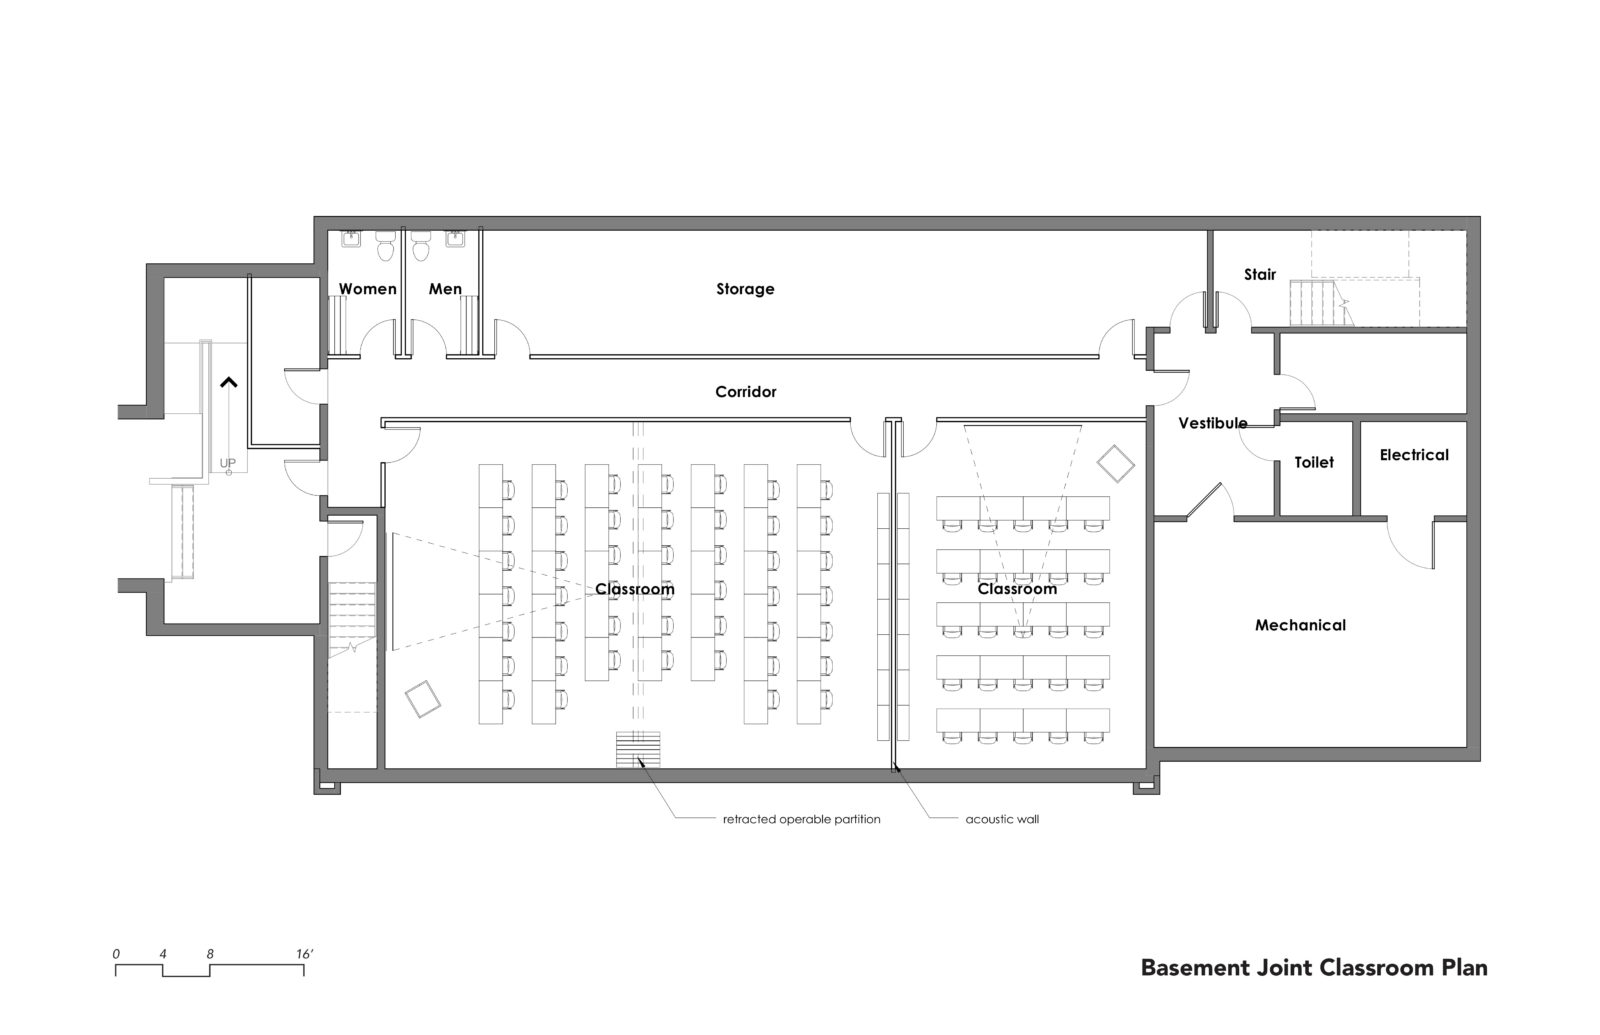 st james classroom plan